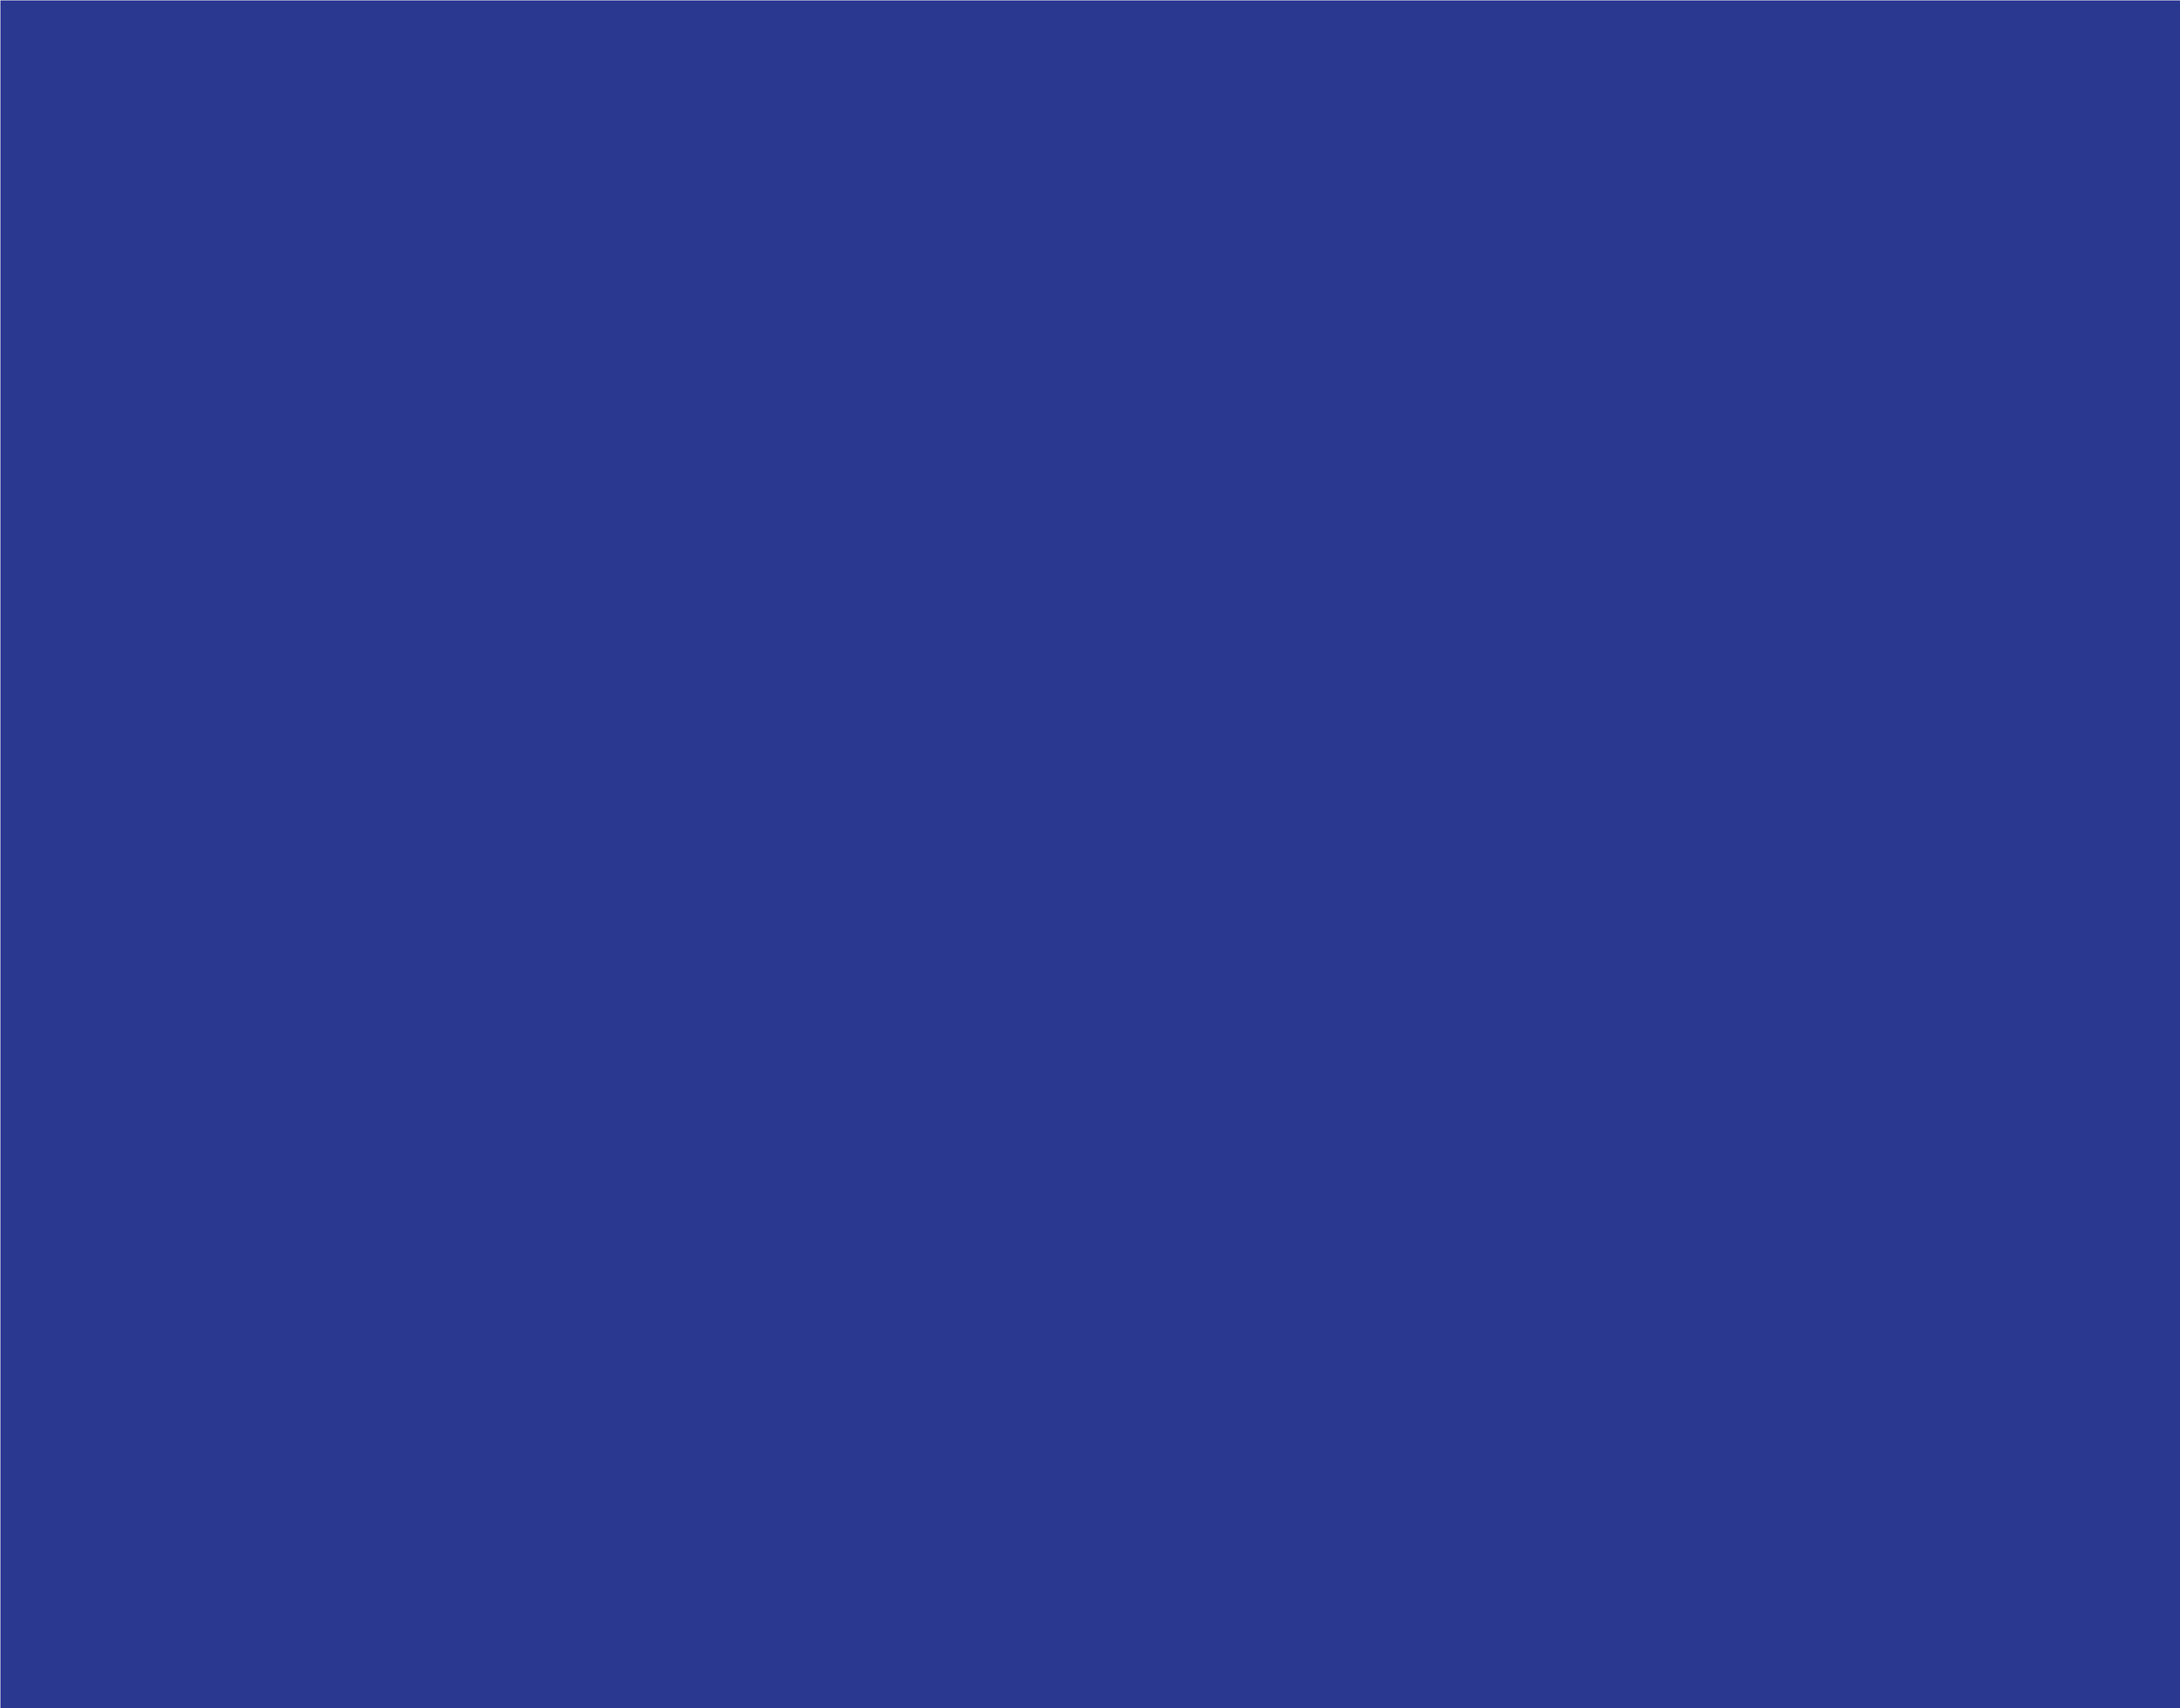 Current Representatives to Executive Council: - Marisa Herson (General Secretary)Martin Börgel (Treasurer)AATB – Roman Hitchev, Beverly BlissALABAT – Francisco Martinez, Rafael Prinz, Celina Horak APASTB – Heri Suroto, Ken Urabe, Suzina Sheikh Ab HamidBAA – Gavin Van Der Meer, Linda Manning, Kellie Hamilton EATCB – Jacinto Sanchez-Ibanez, Diletta Trojan, Simone HennerbichlerSATIBA – Michael Pepper